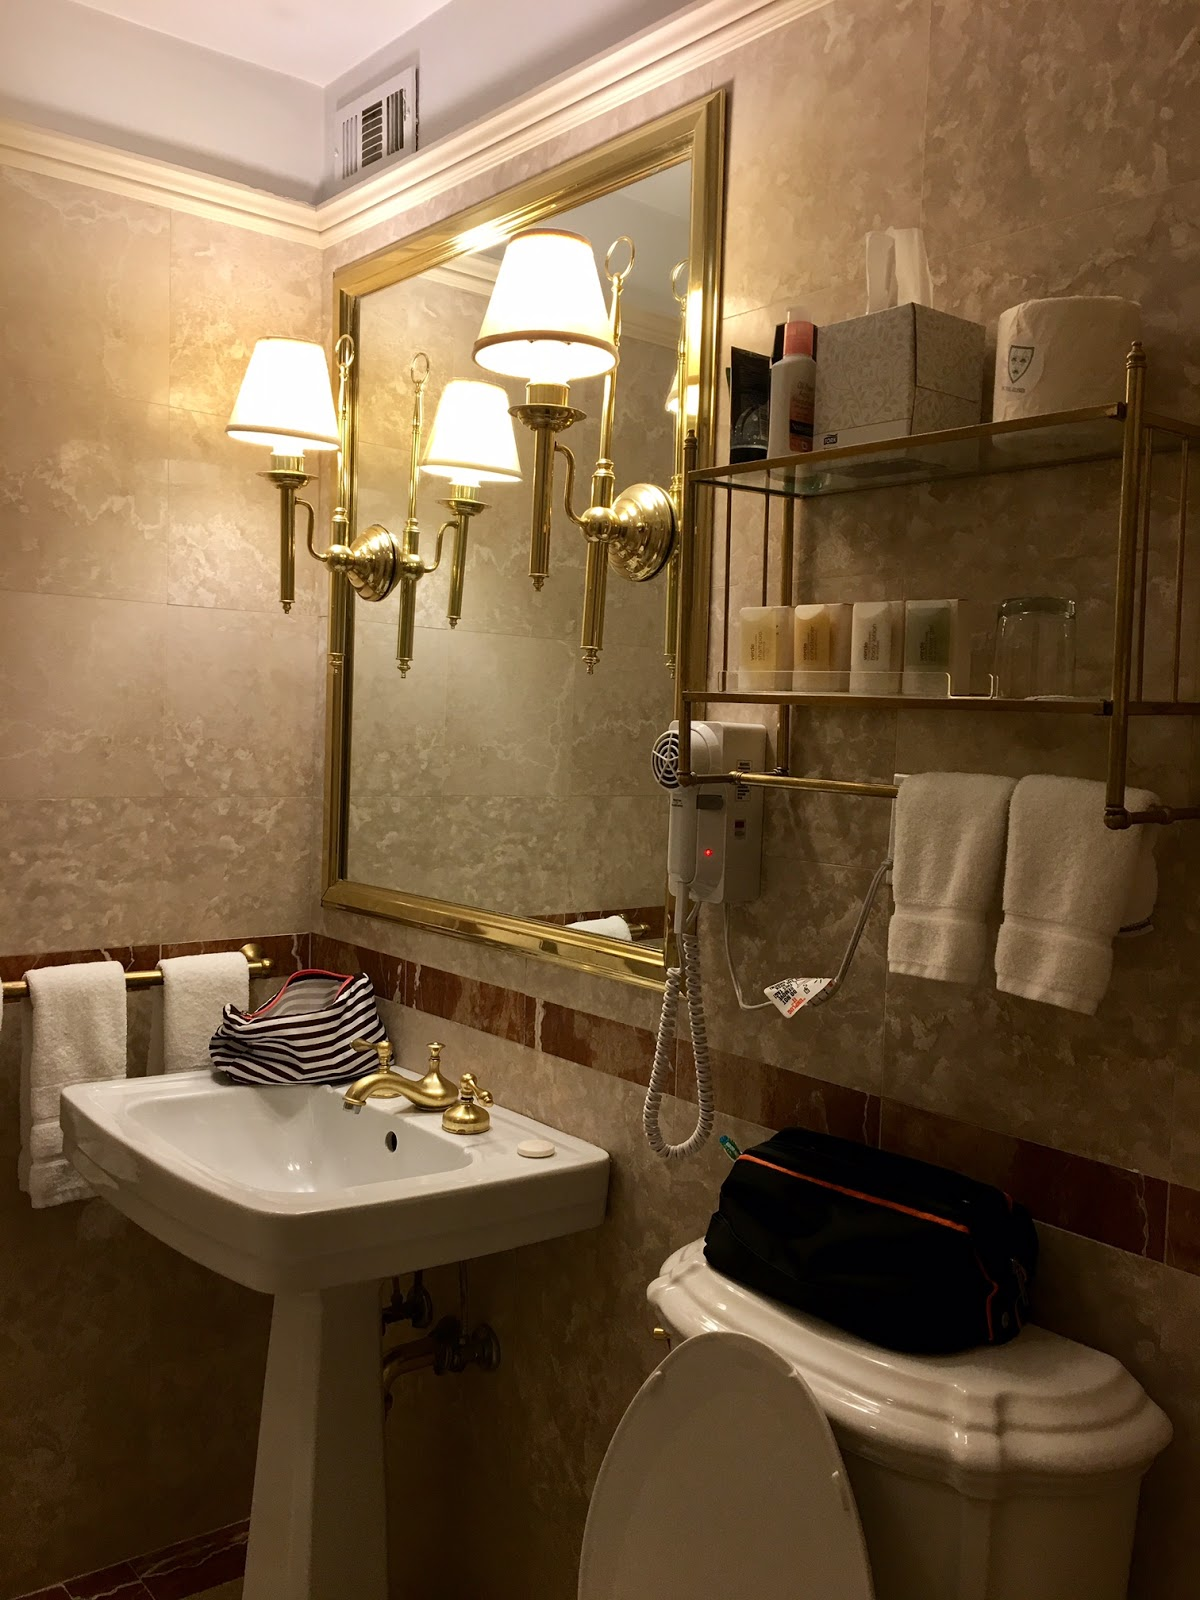 Hotel Elysee Bathroom